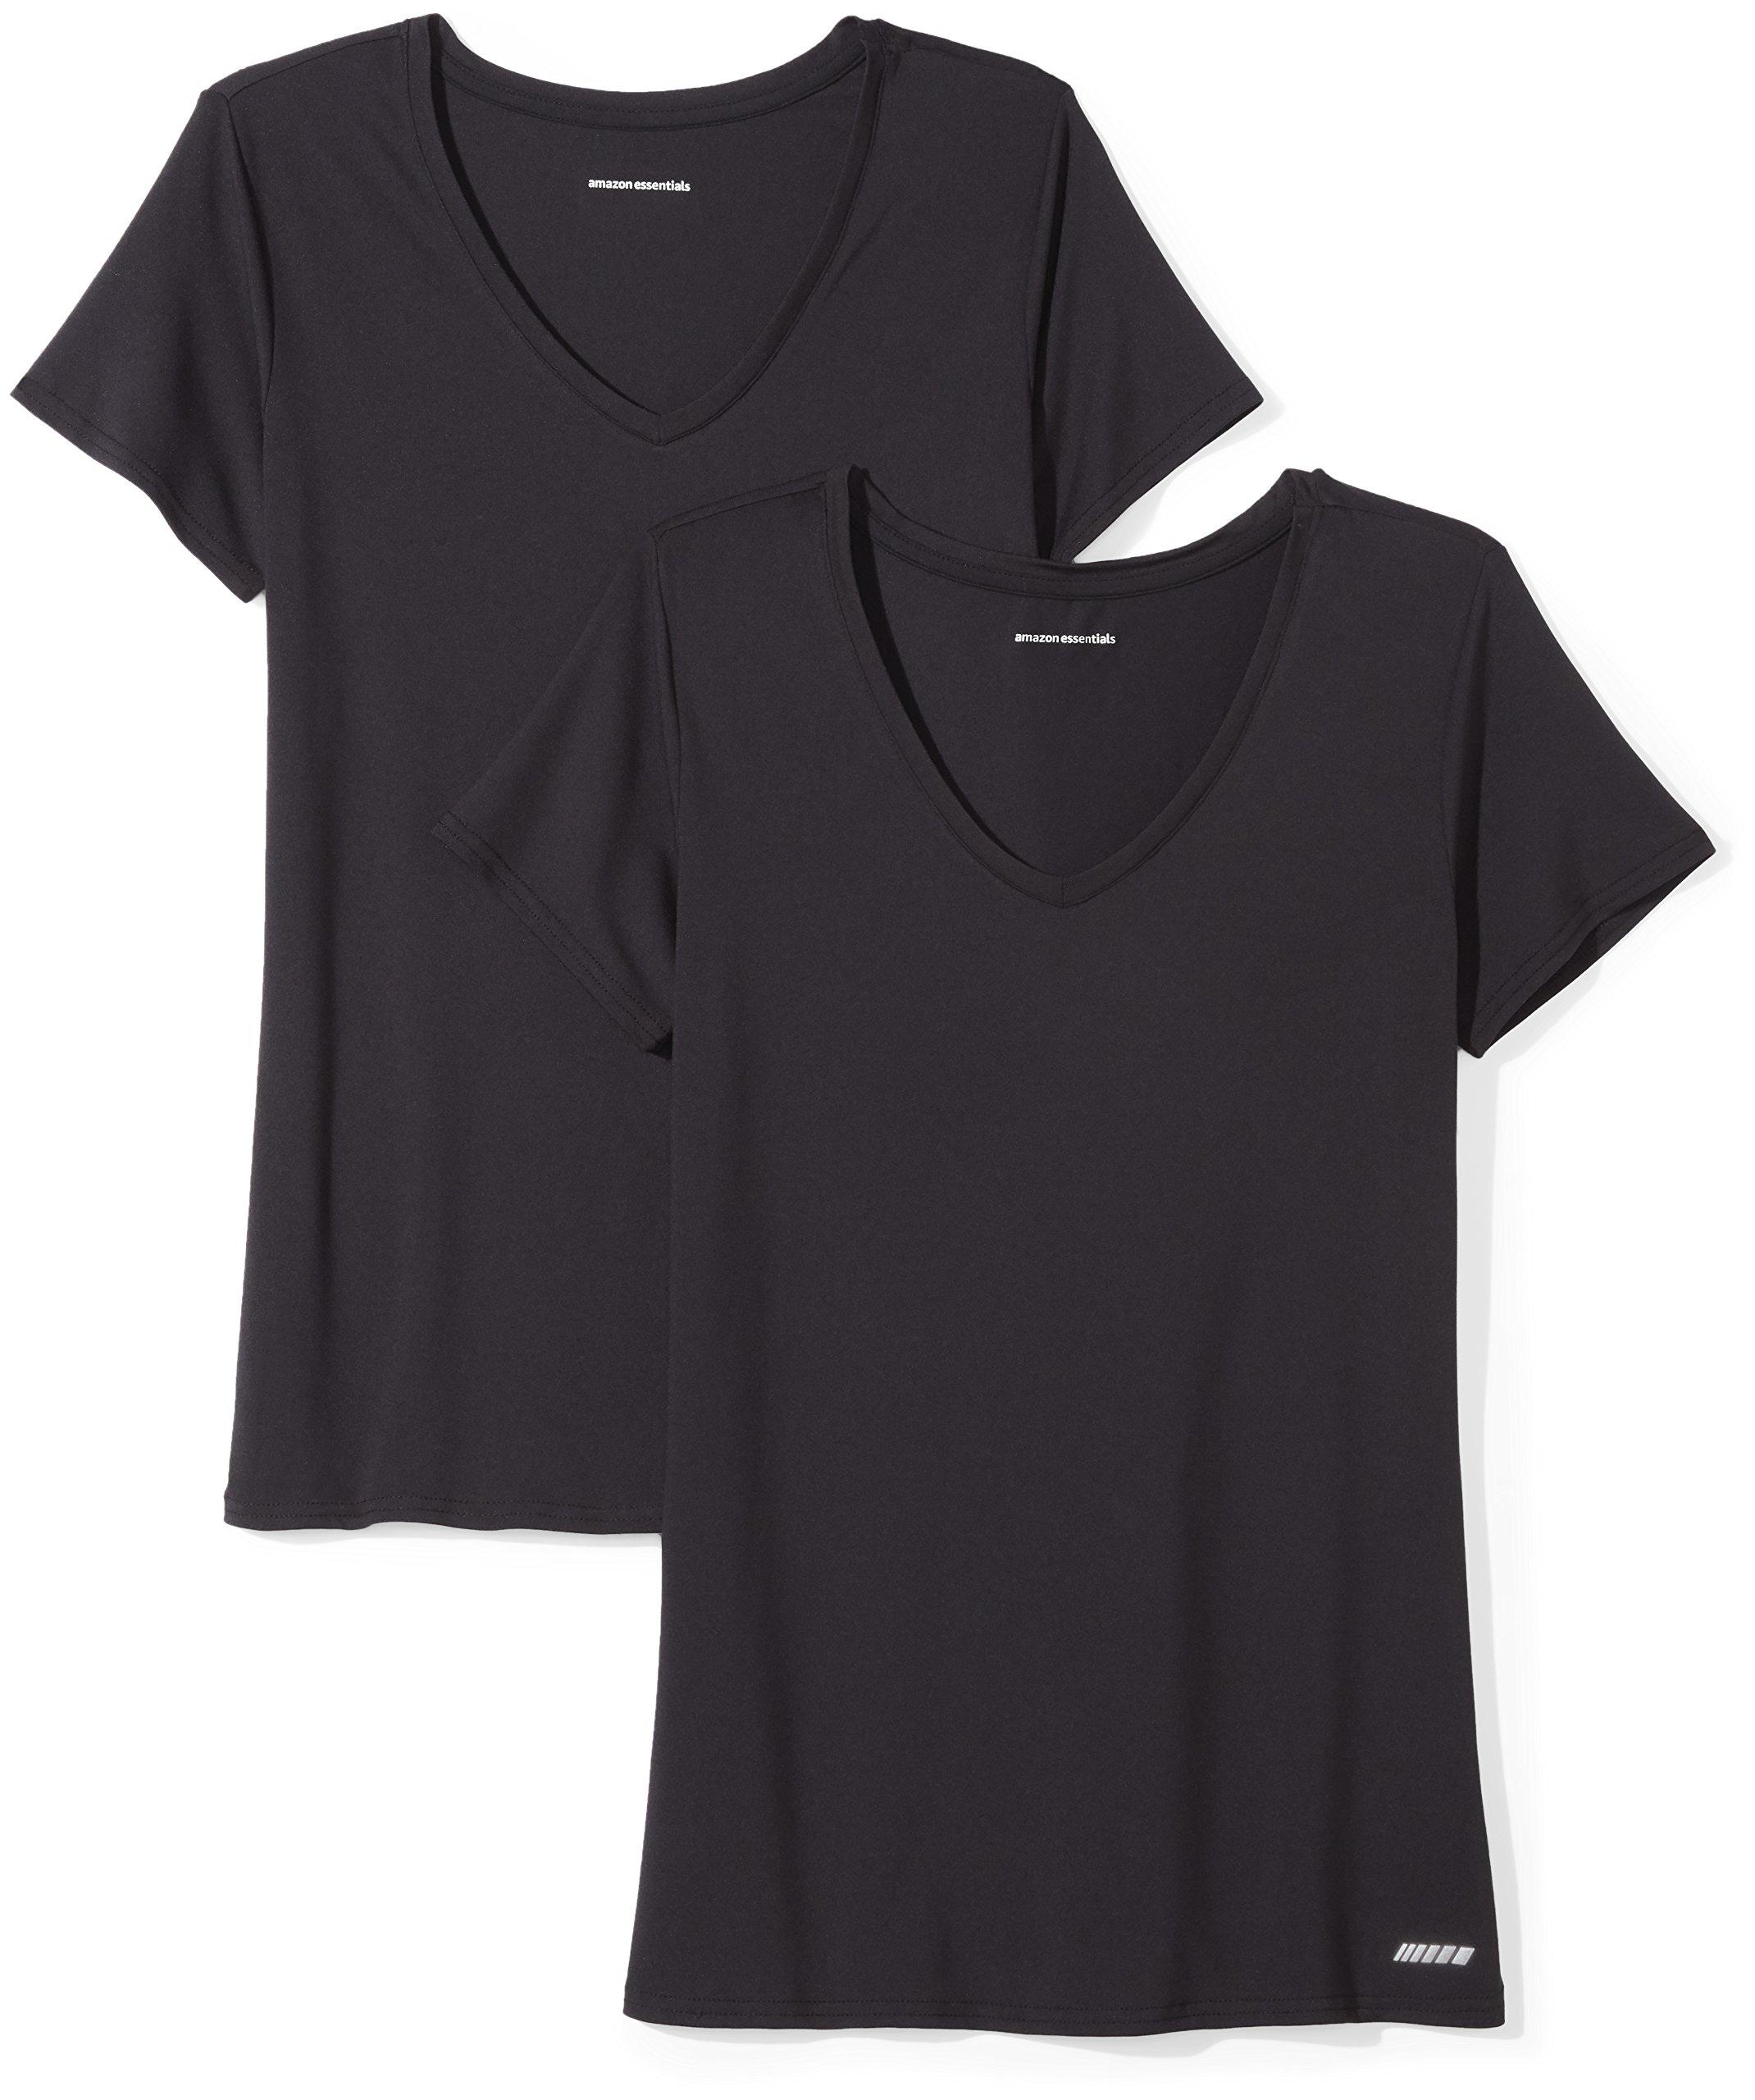 Amazon Essentials Women's Standard 2-Pack Tech Stretch Short-Sleeve V-Neck T-Shirt Black, Large